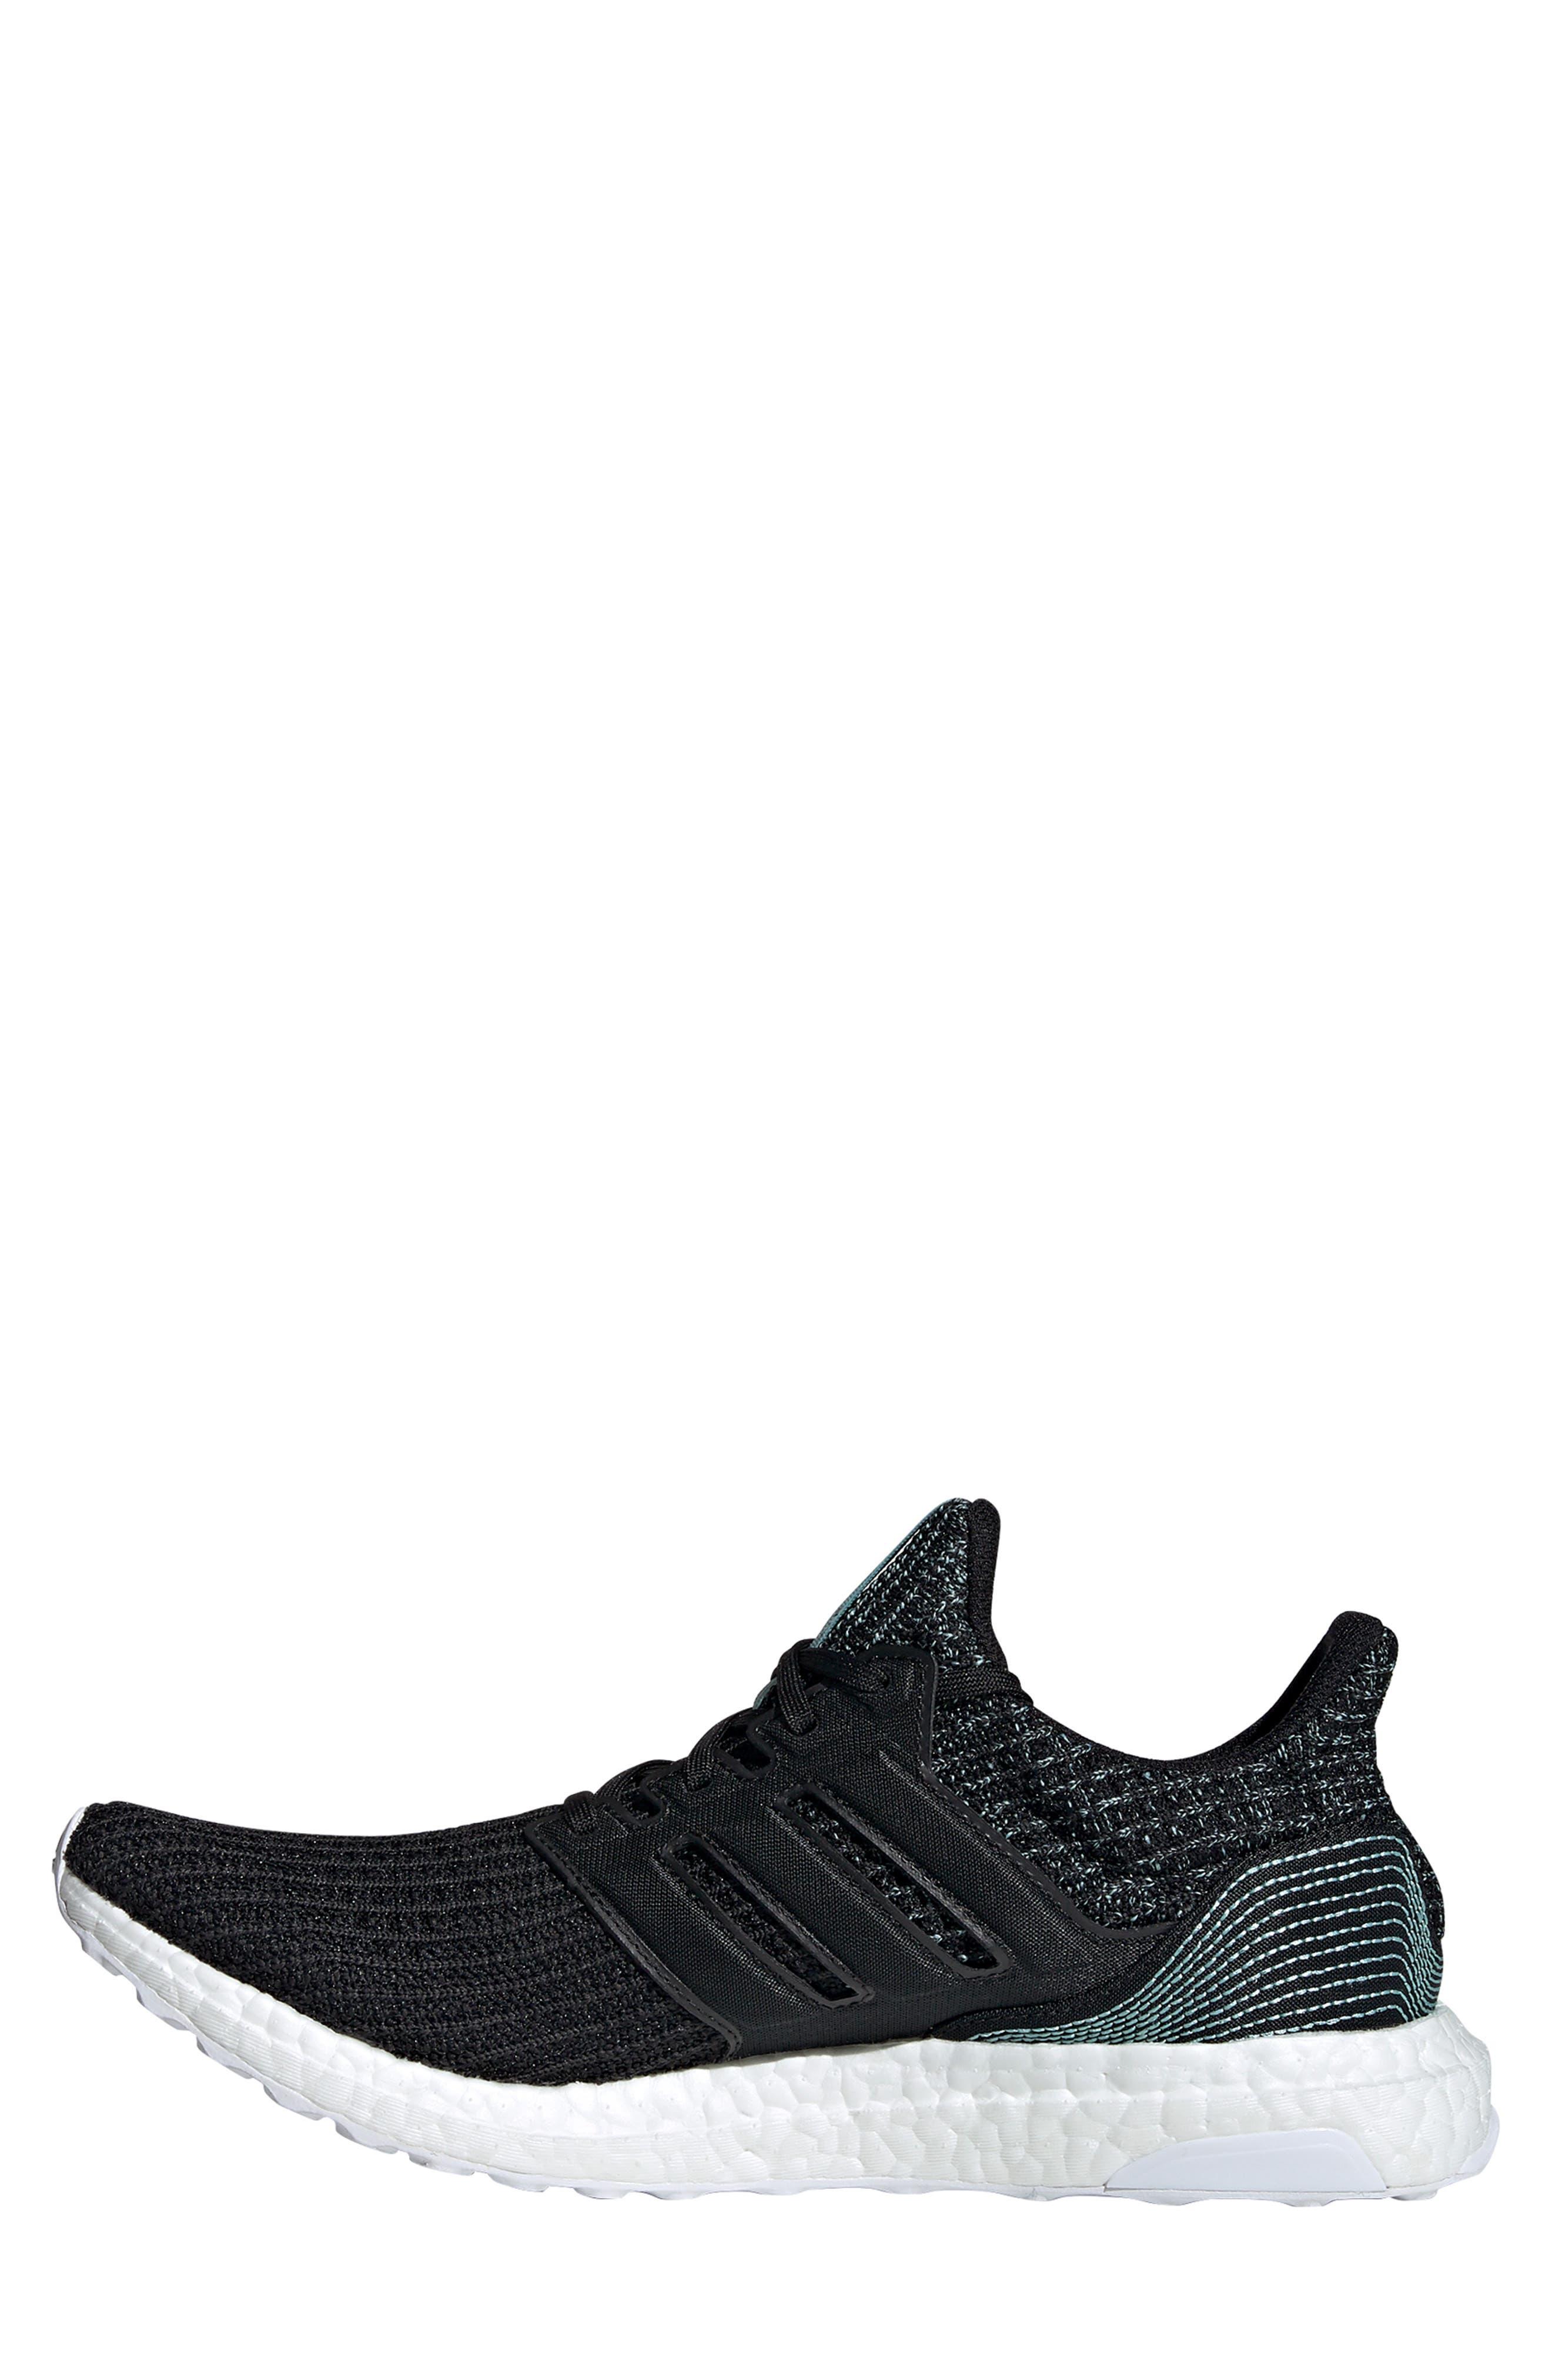 Parley UltraBoost Sneaker,                             Alternate thumbnail 10, color,                             001